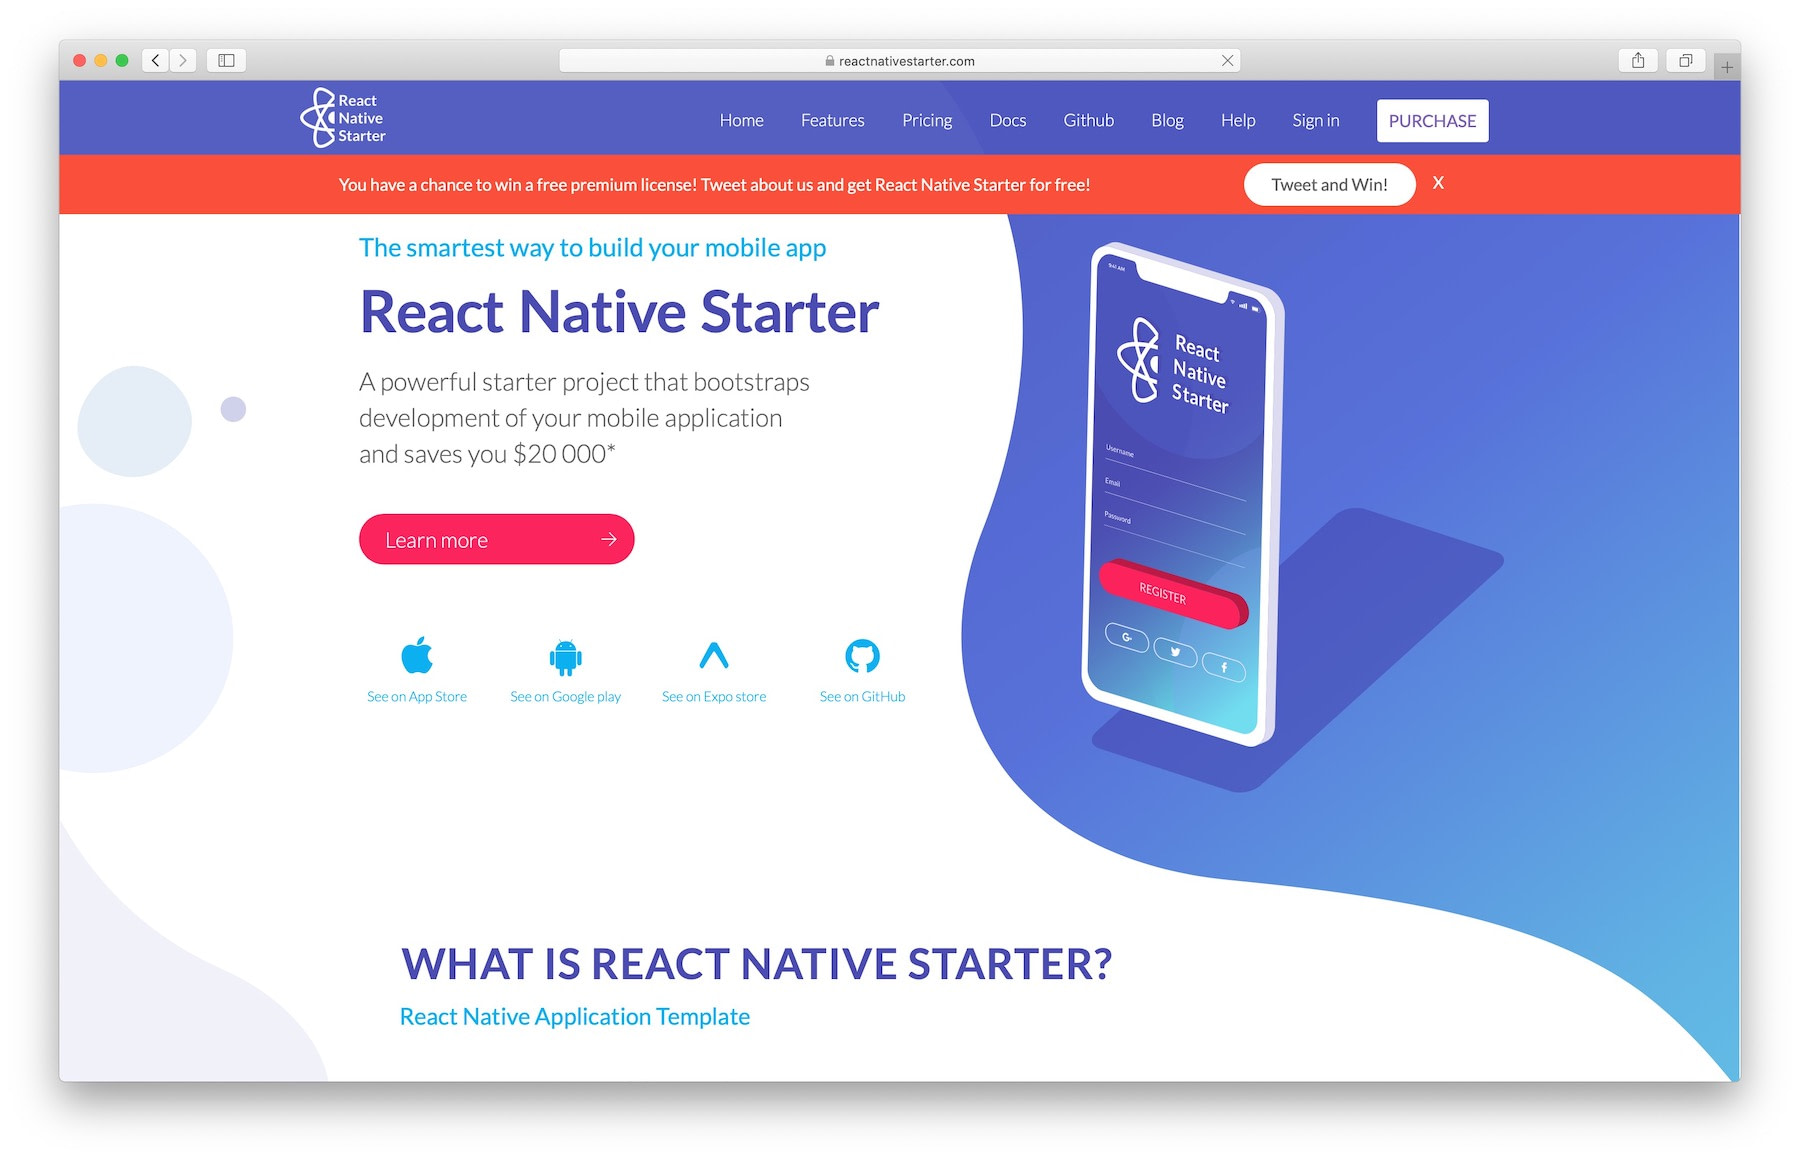 React Native Starter